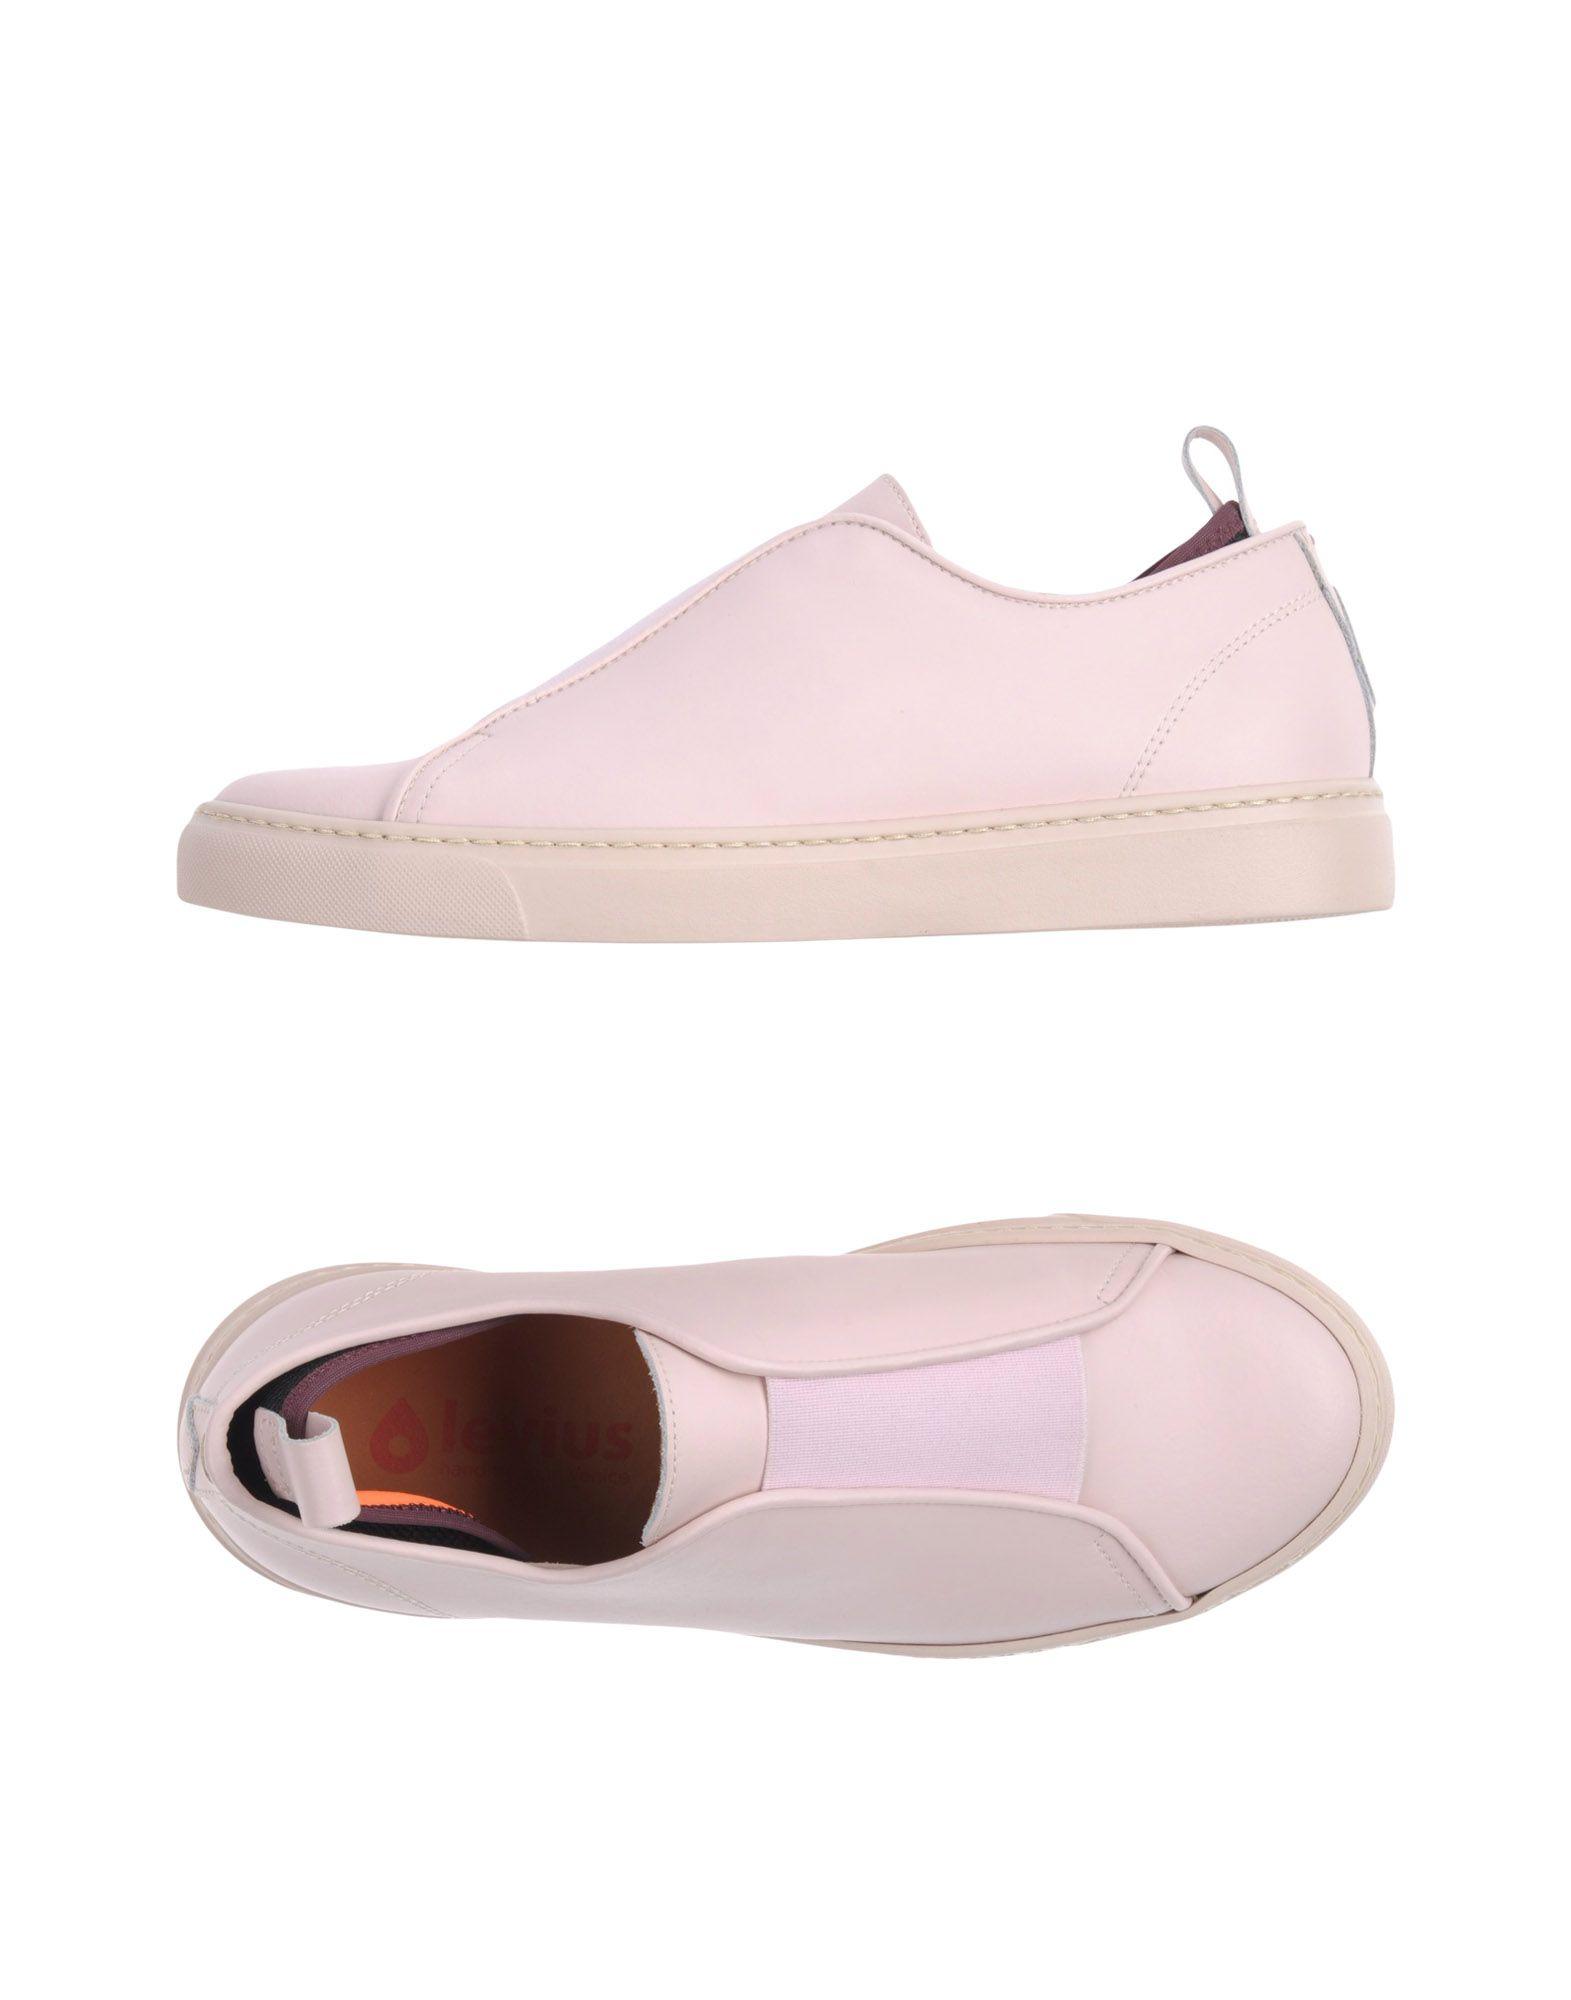 Gut um billige Schuhe Damen zu tragenLevius Sneakers Damen Schuhe  11385415LK a5e623